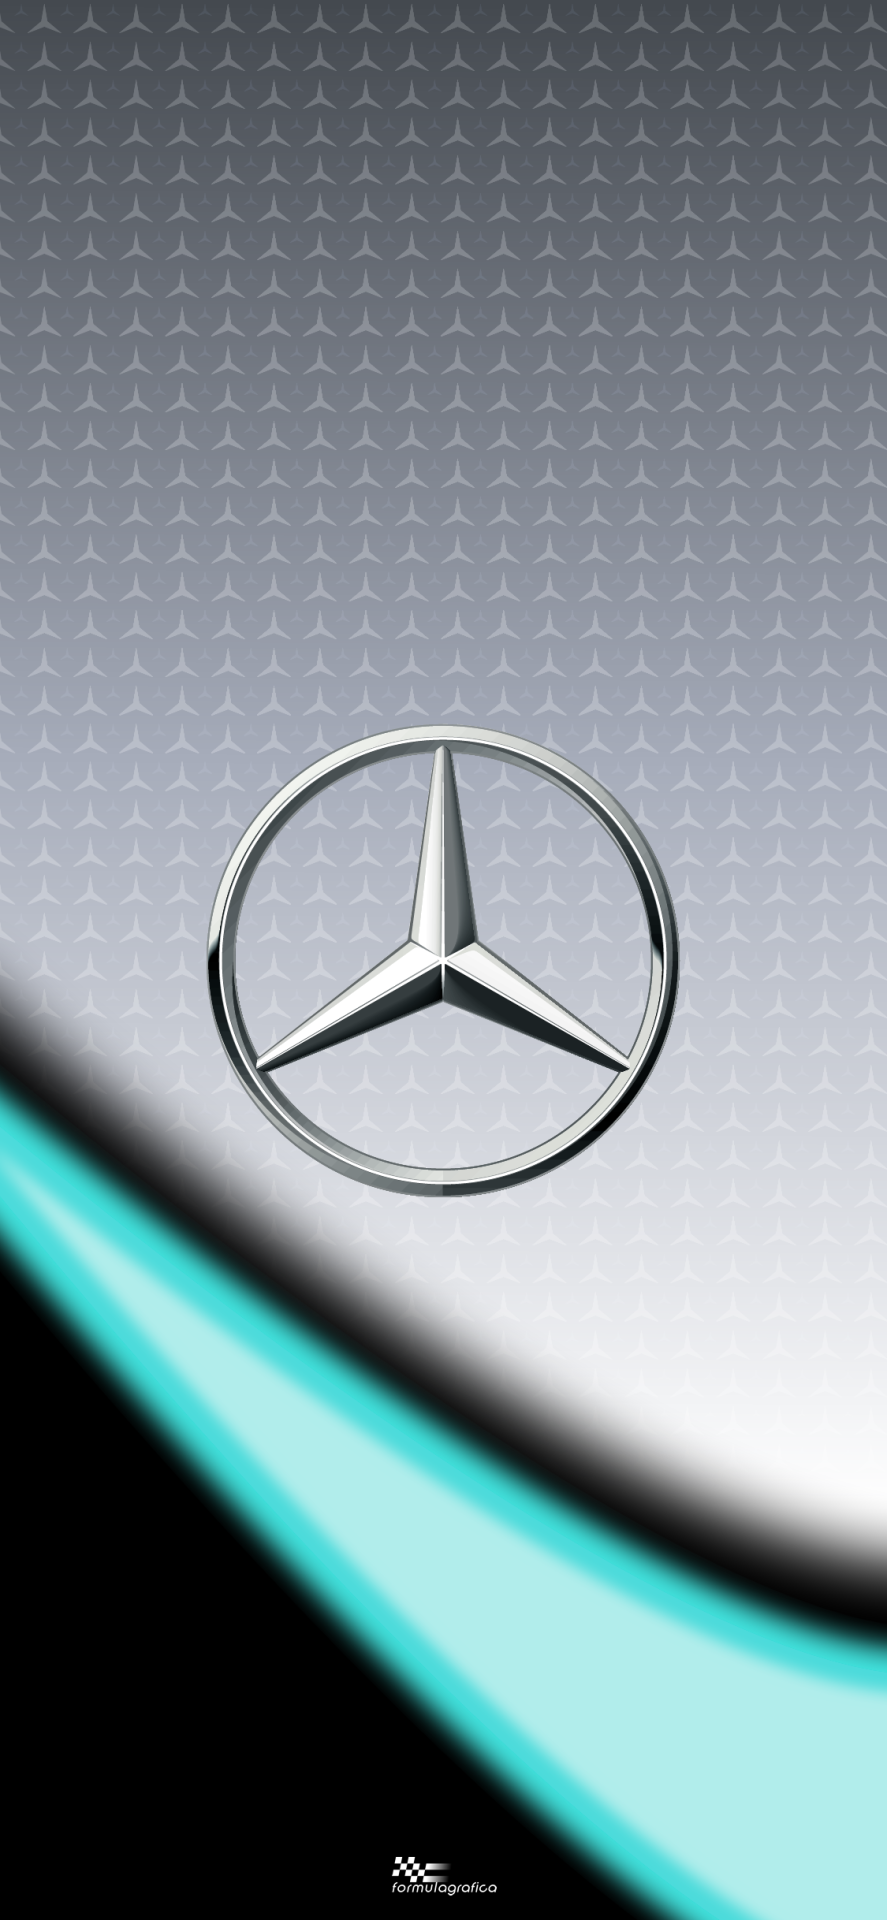 Iphone Smartphone Wallpaper Mercedes Amg Petronas Wallpaper Iphone 887x1920 Download Hd Wallpaper Wallpapertip